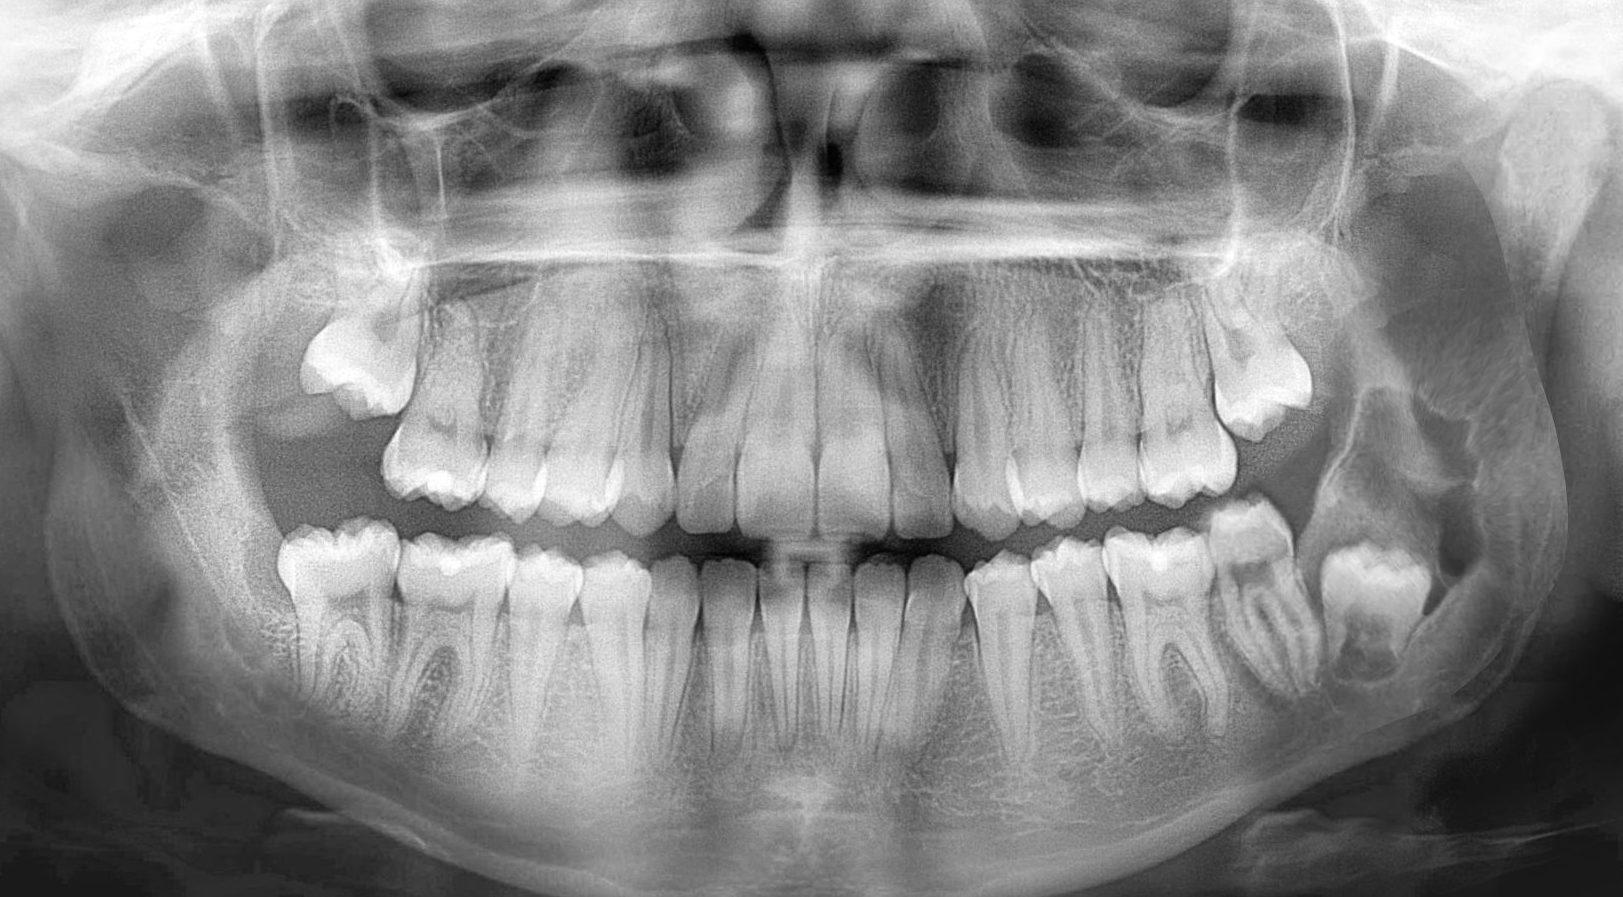 OPG-Follikularzyste-38-zahnarztpraxis-arkaden